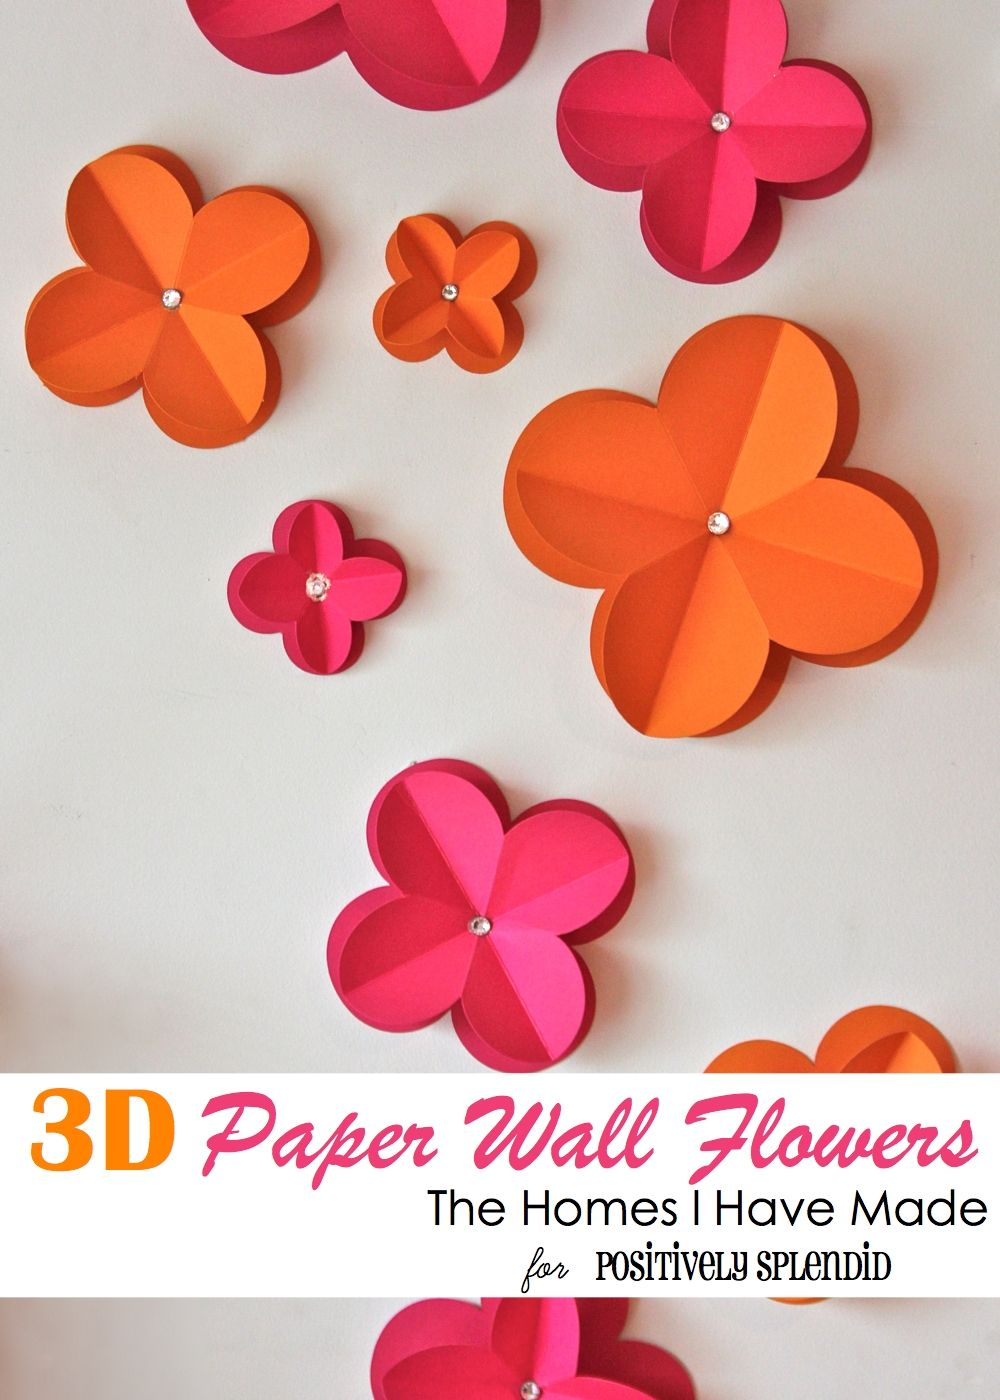 3d Paper Wall Flowers Paper Walls 3d Paper And 3d